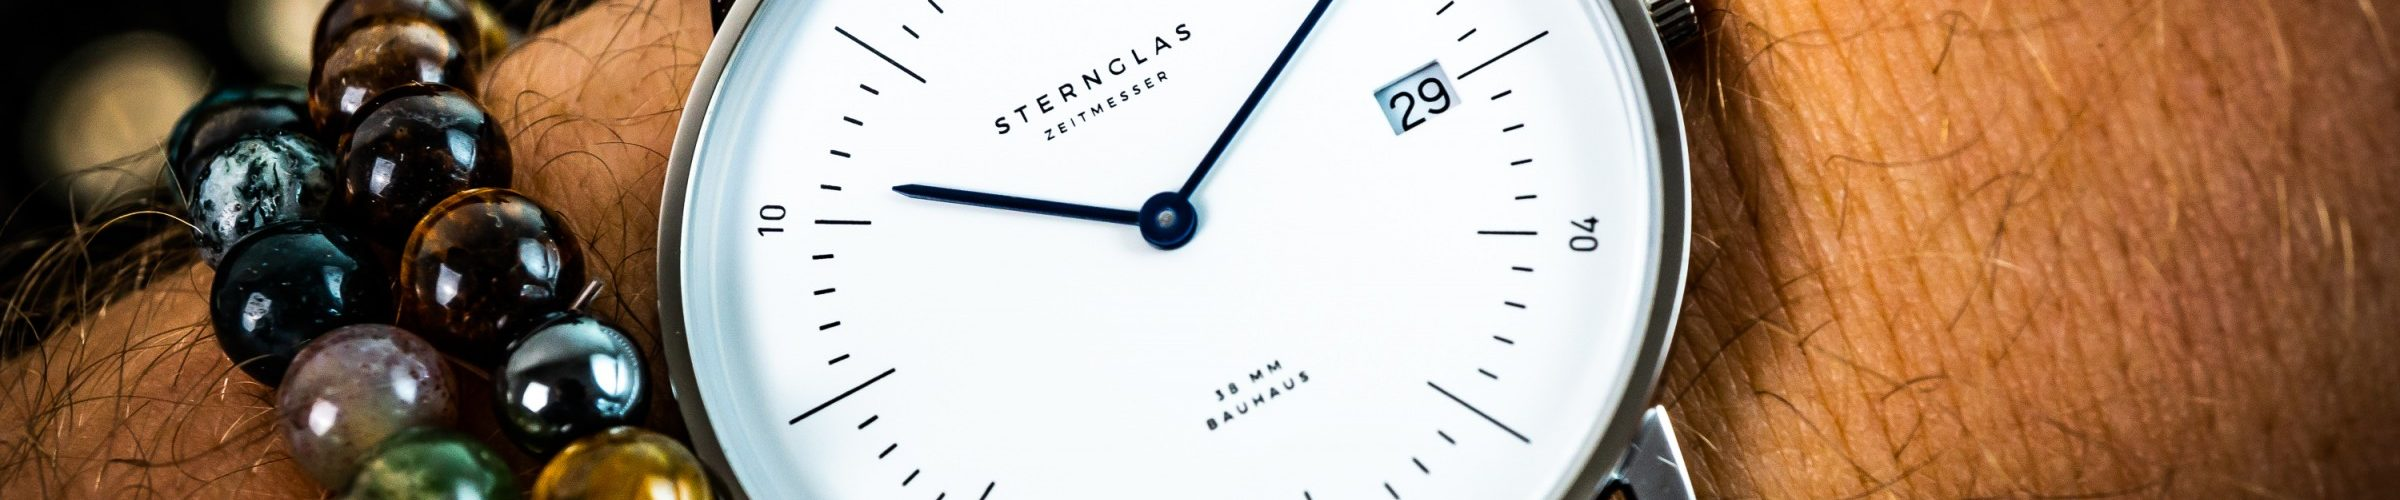 STERNGLAS NAOS Bauhaus Uhr Test